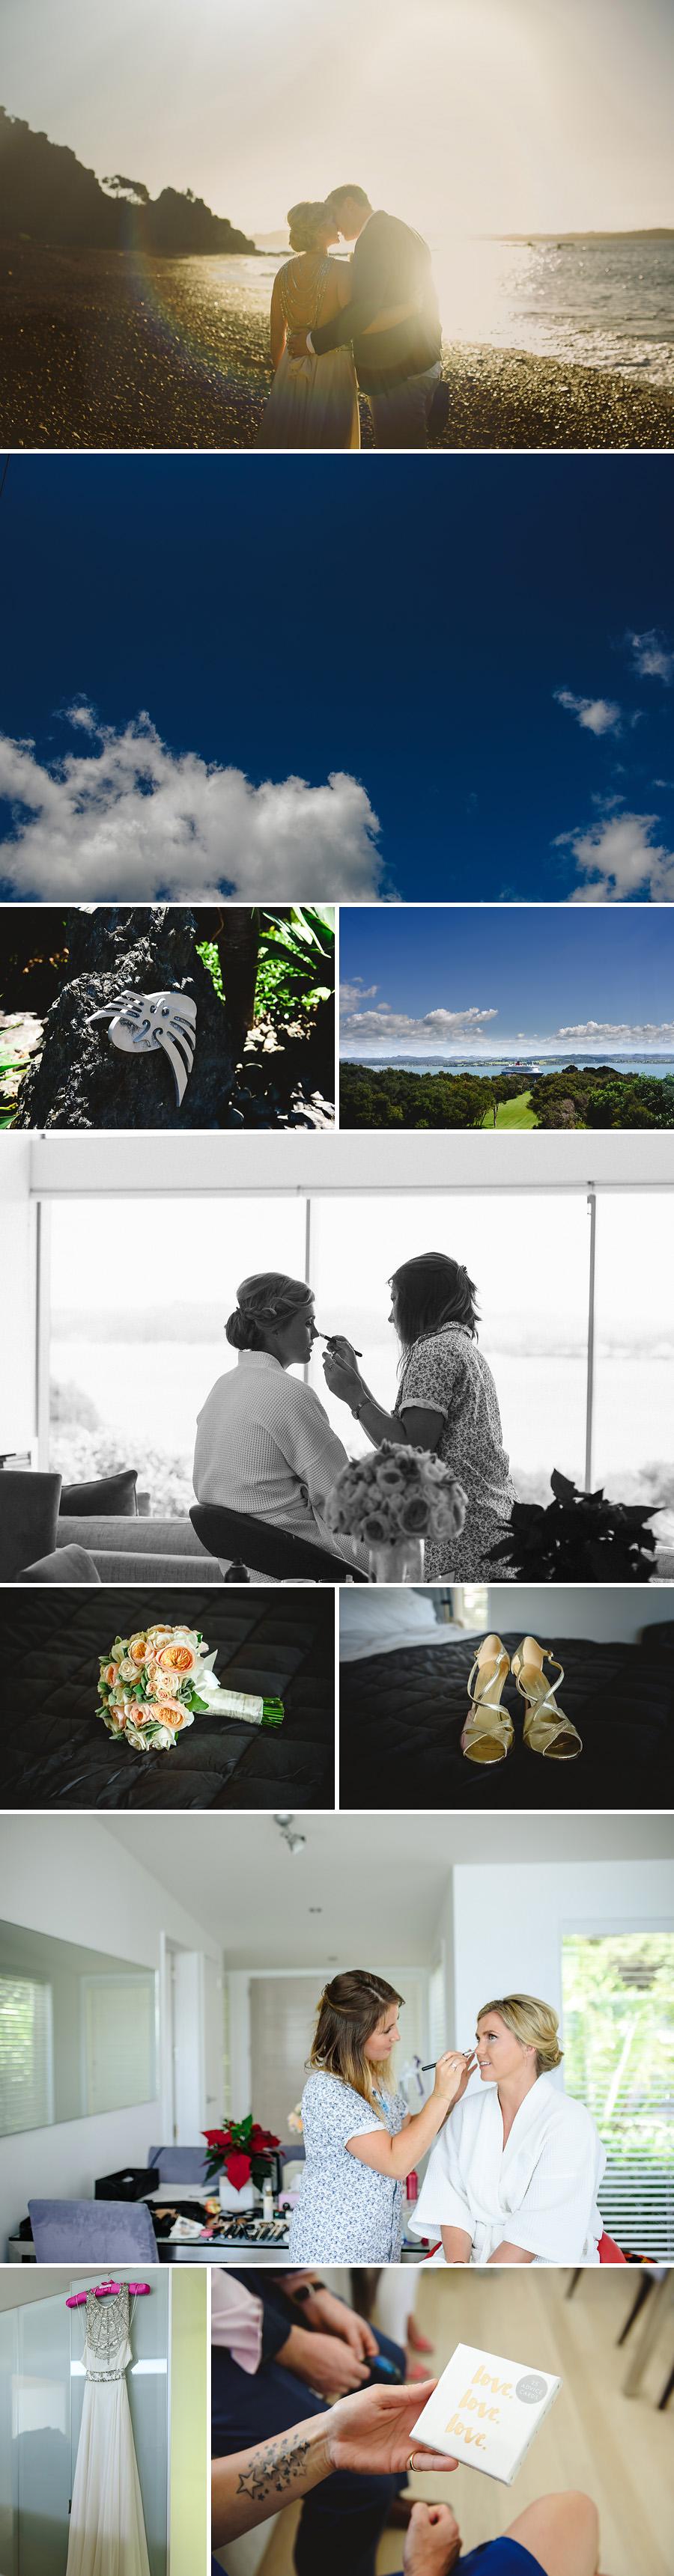 Eagles Nest wedding in Northland NZ. Photographer Jess Burges